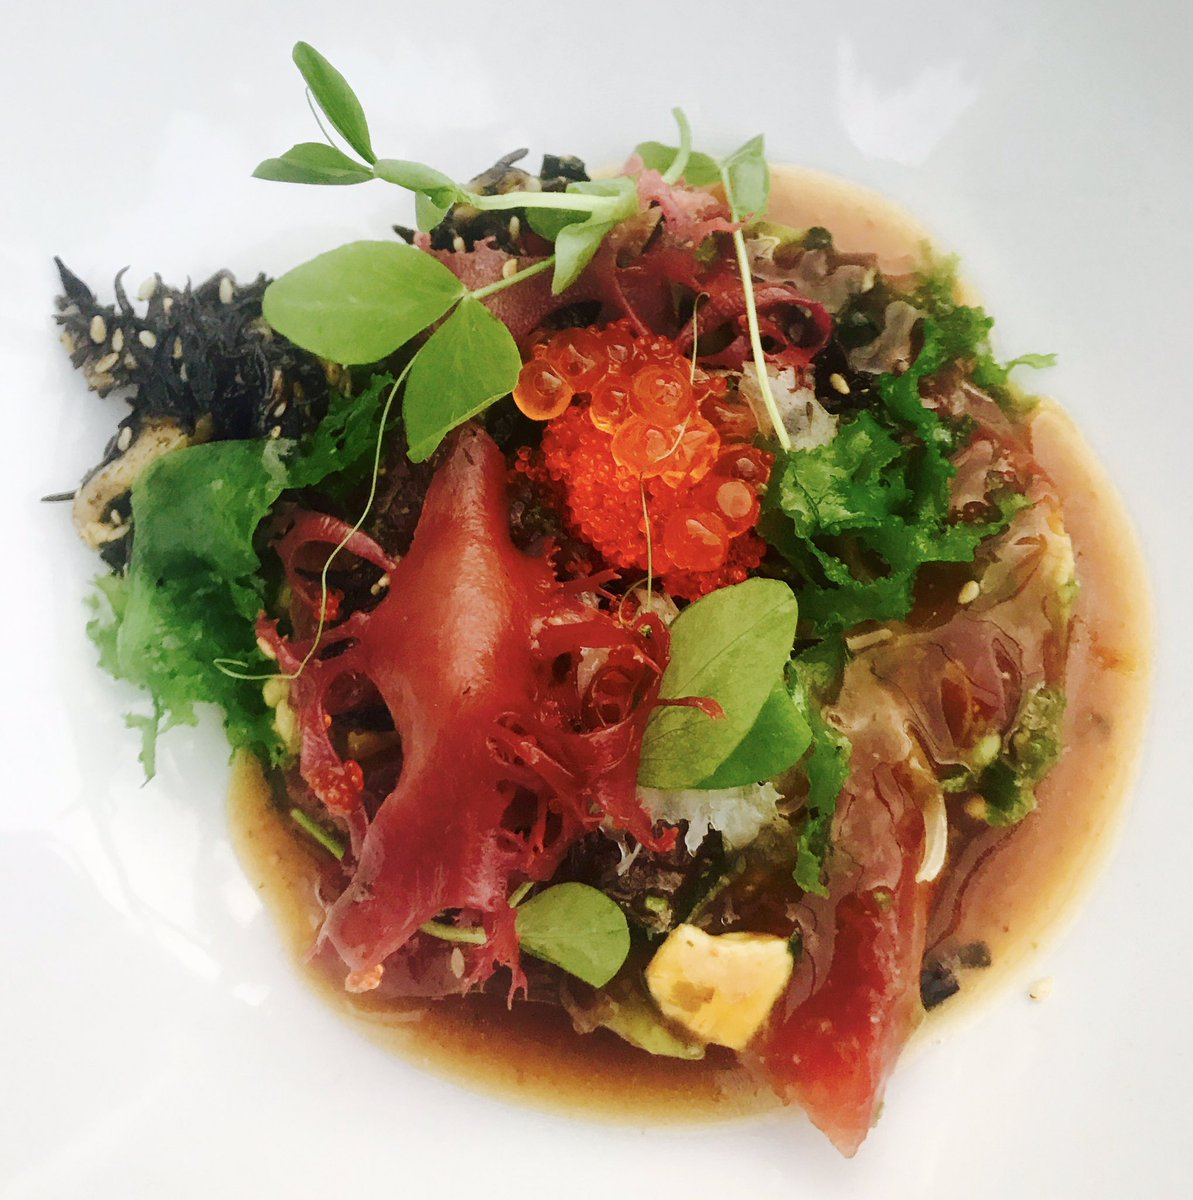 An amazing #tuna delight at De Tokio a Lima restaurant @HotelCanAlomar #palma #mallorca<br>http://pic.twitter.com/bzuBt3QIzB